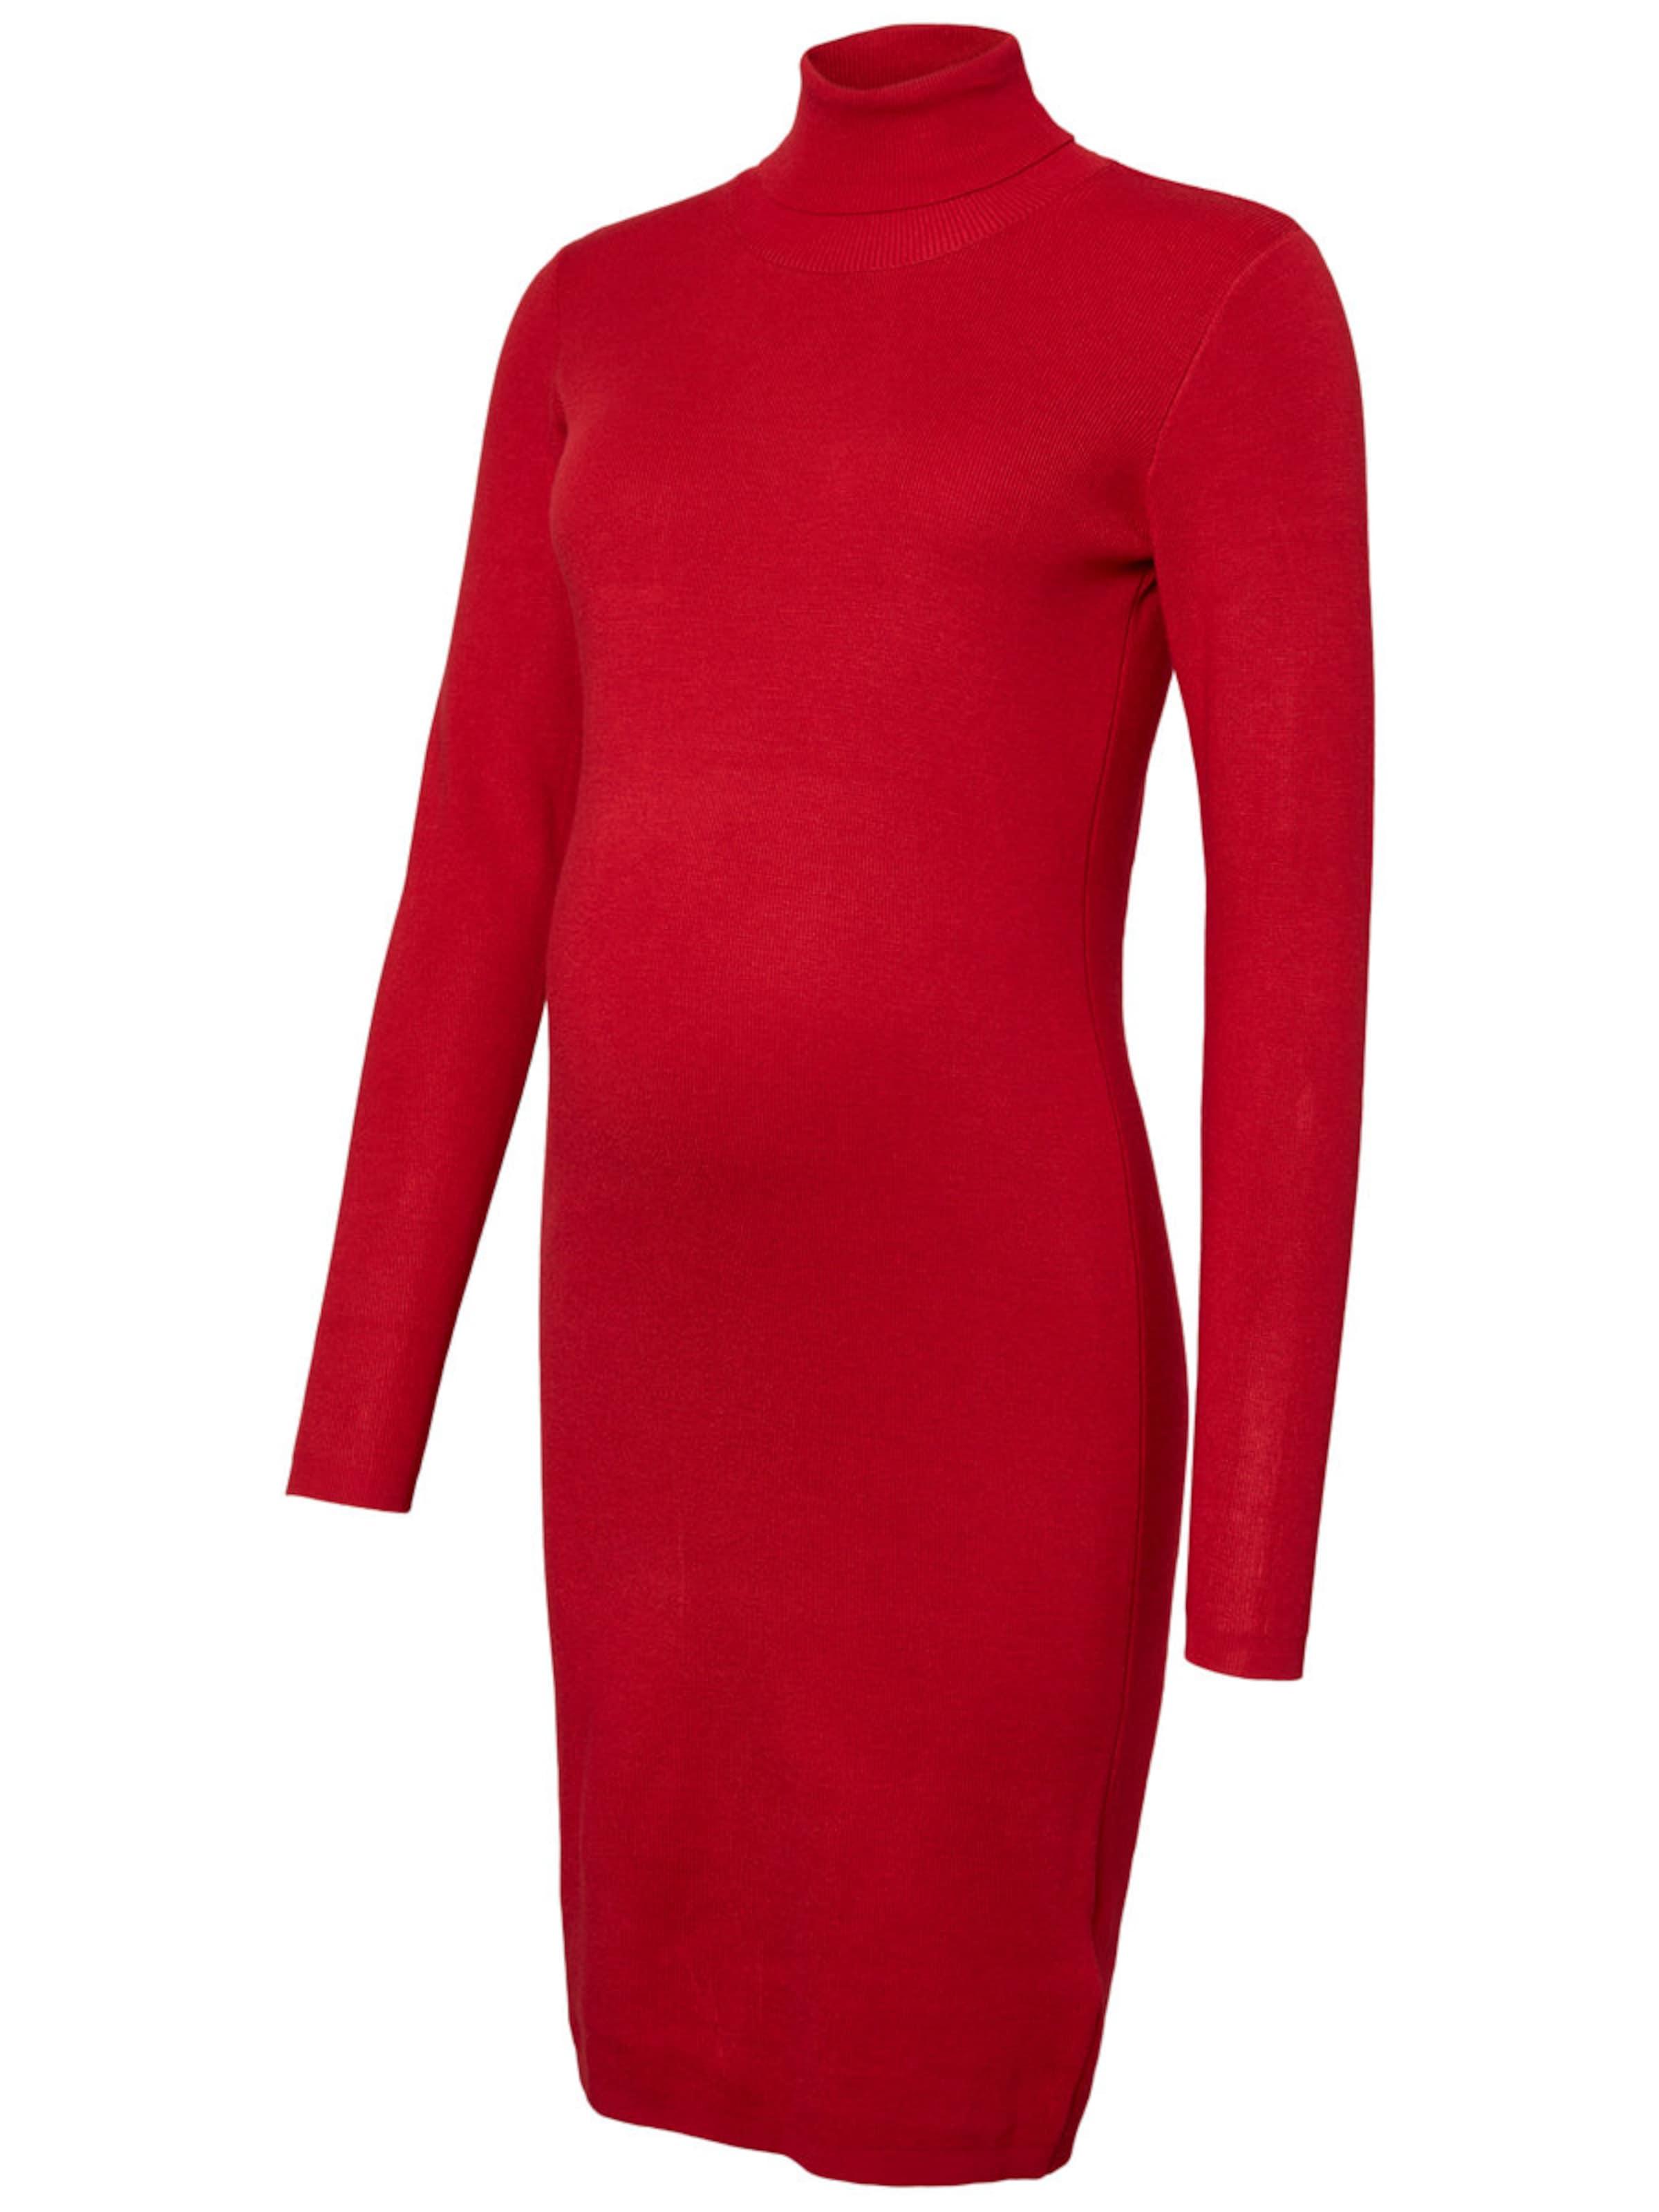 Robe Robe Mamalicious En En Cerise Mamalicious Robe Mamalicious Rouge Rouge Cerise 4L5A3Rj